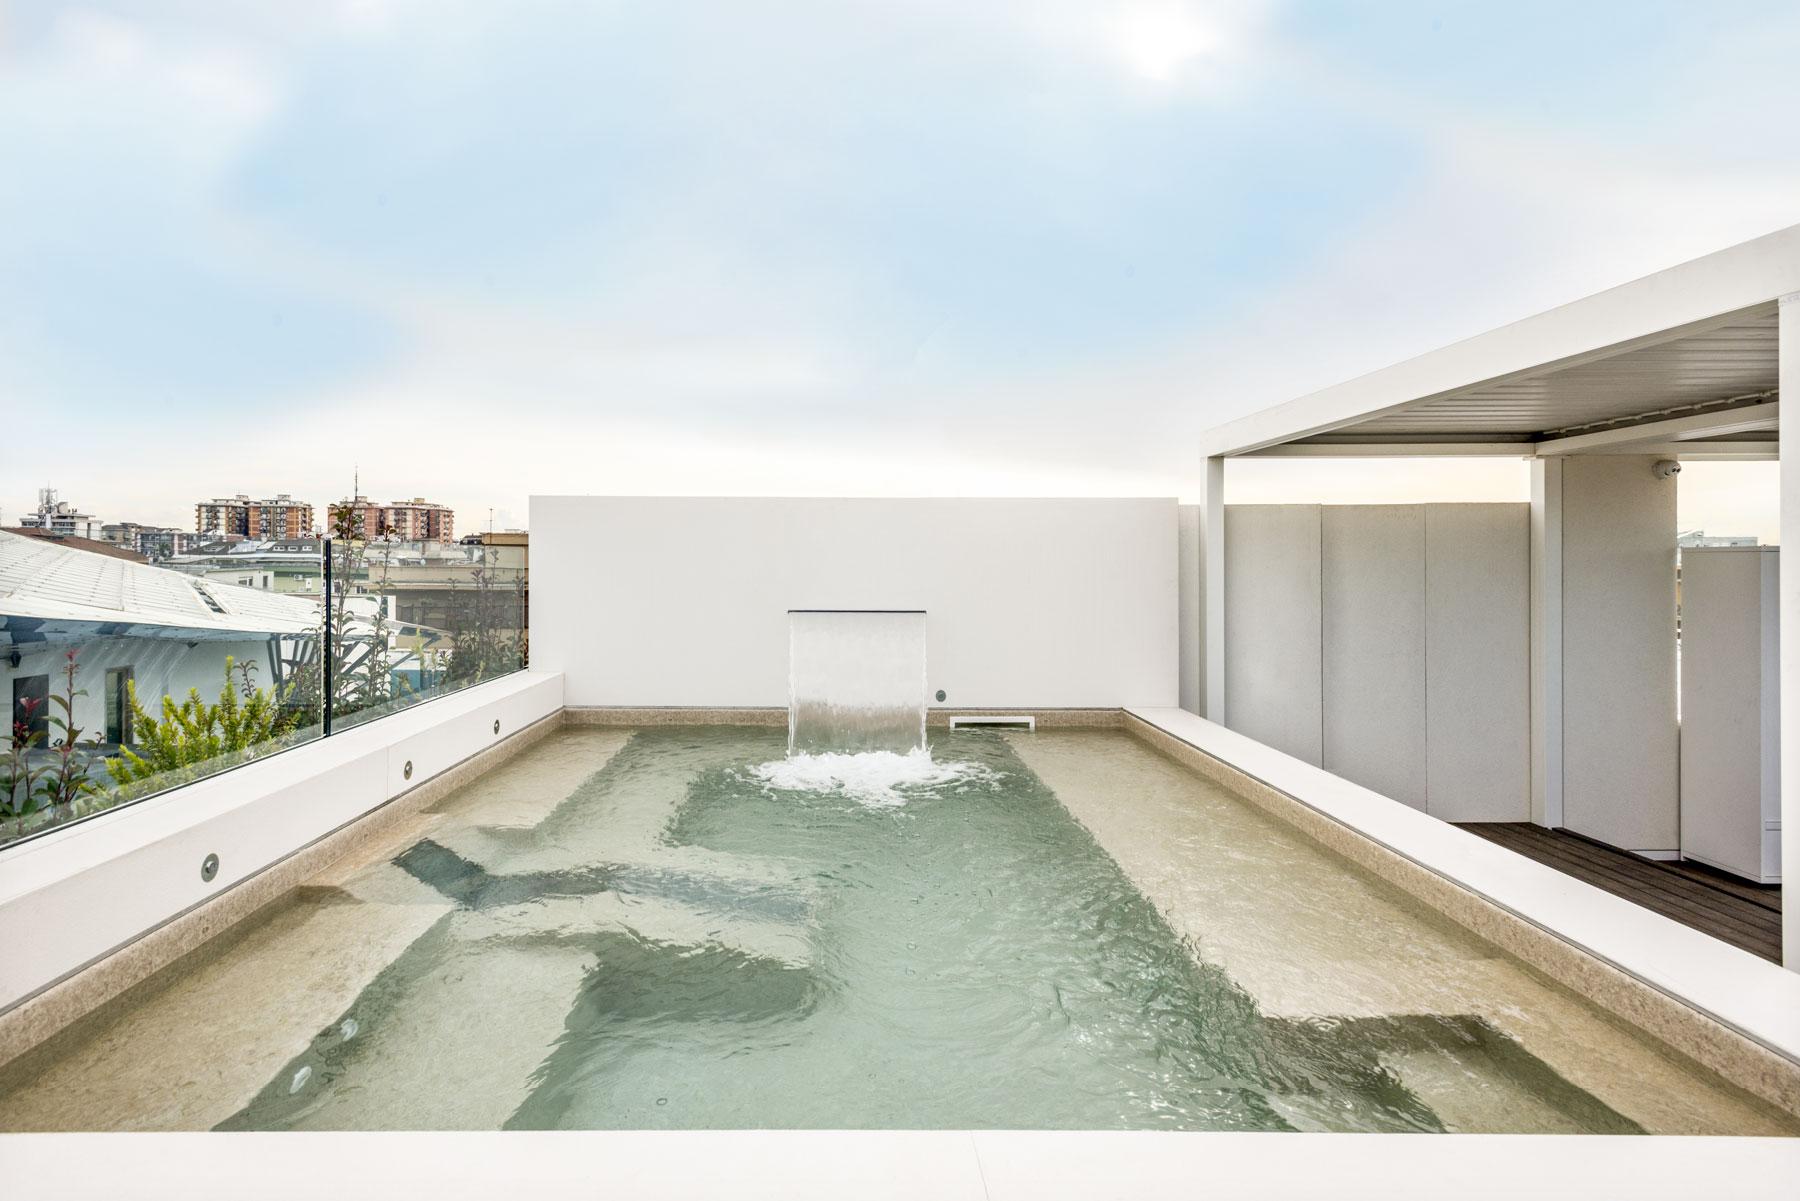 kamenný obklad bazénu